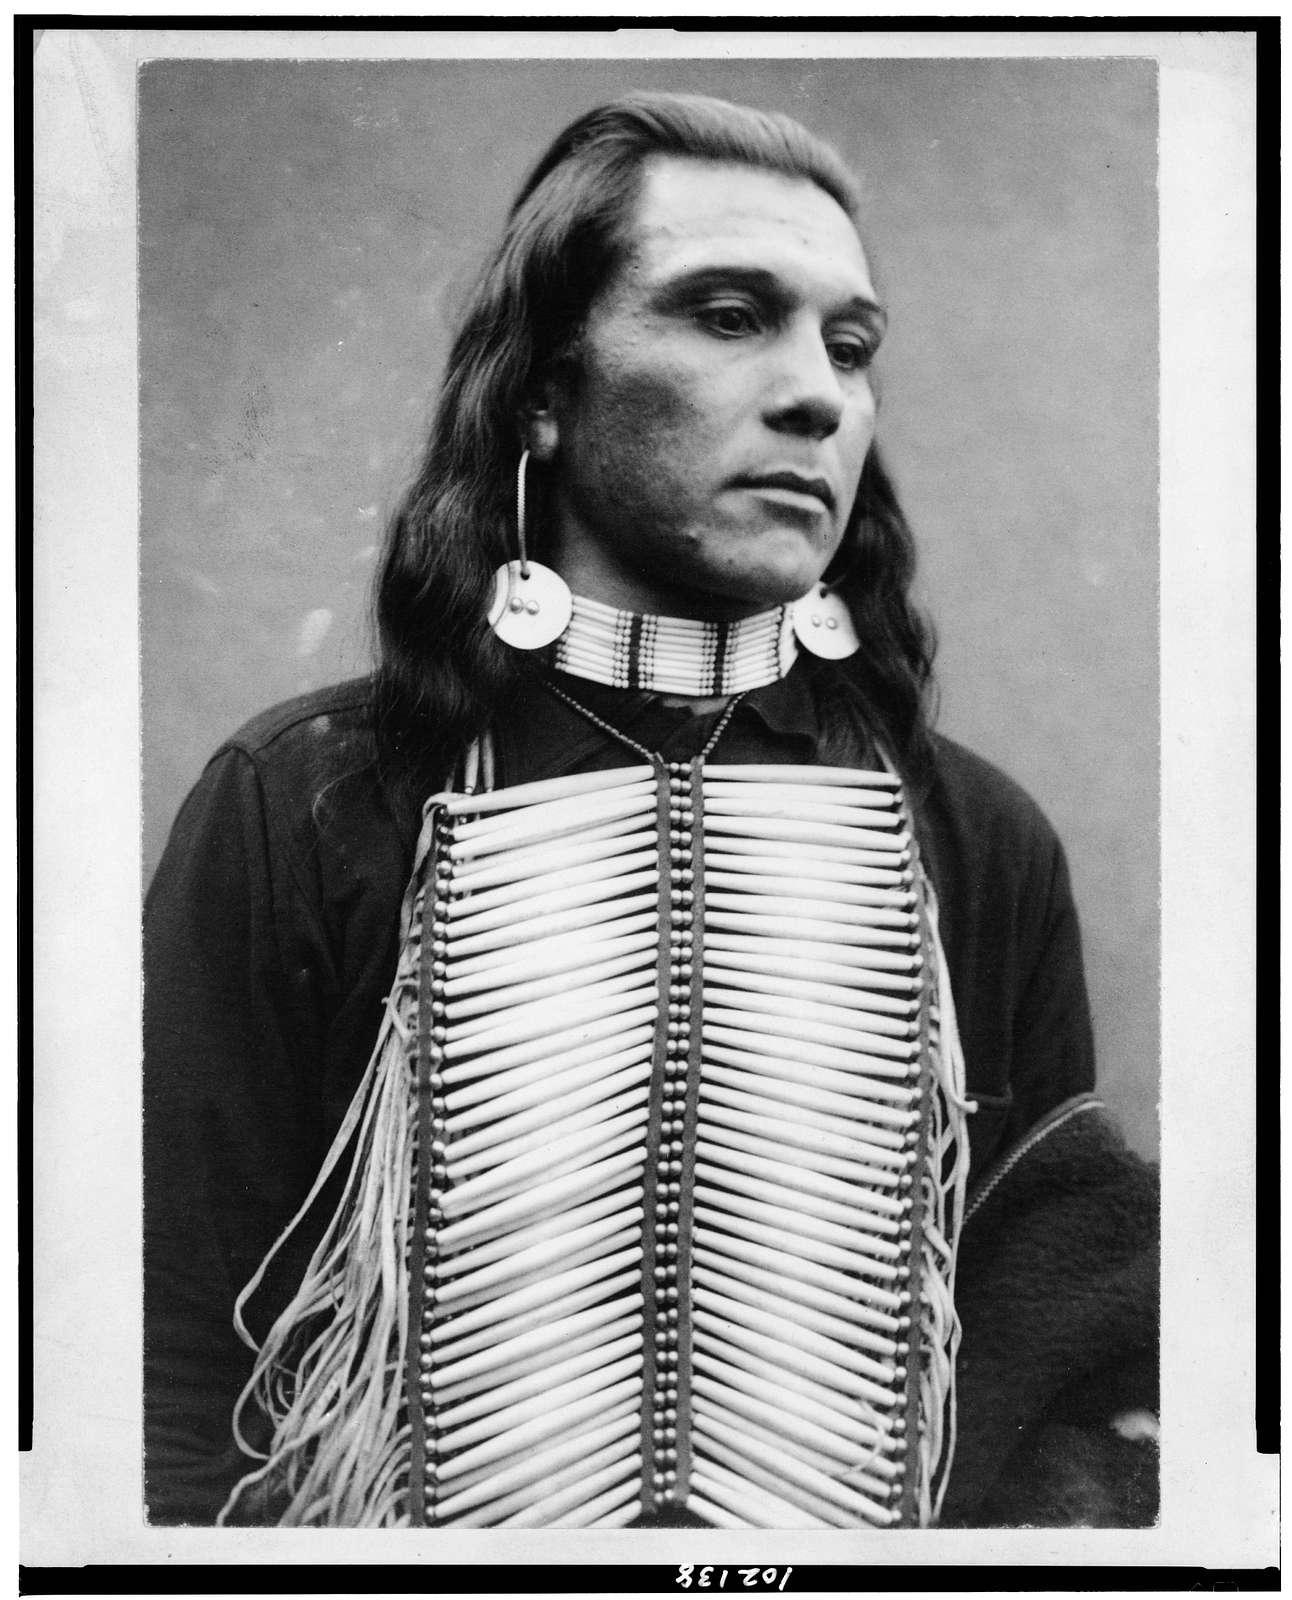 [Po-ca-tel-lo, Yakima or Umatilla Indian, from Oregon, half-length portrait, facing right, wearing breast plate]